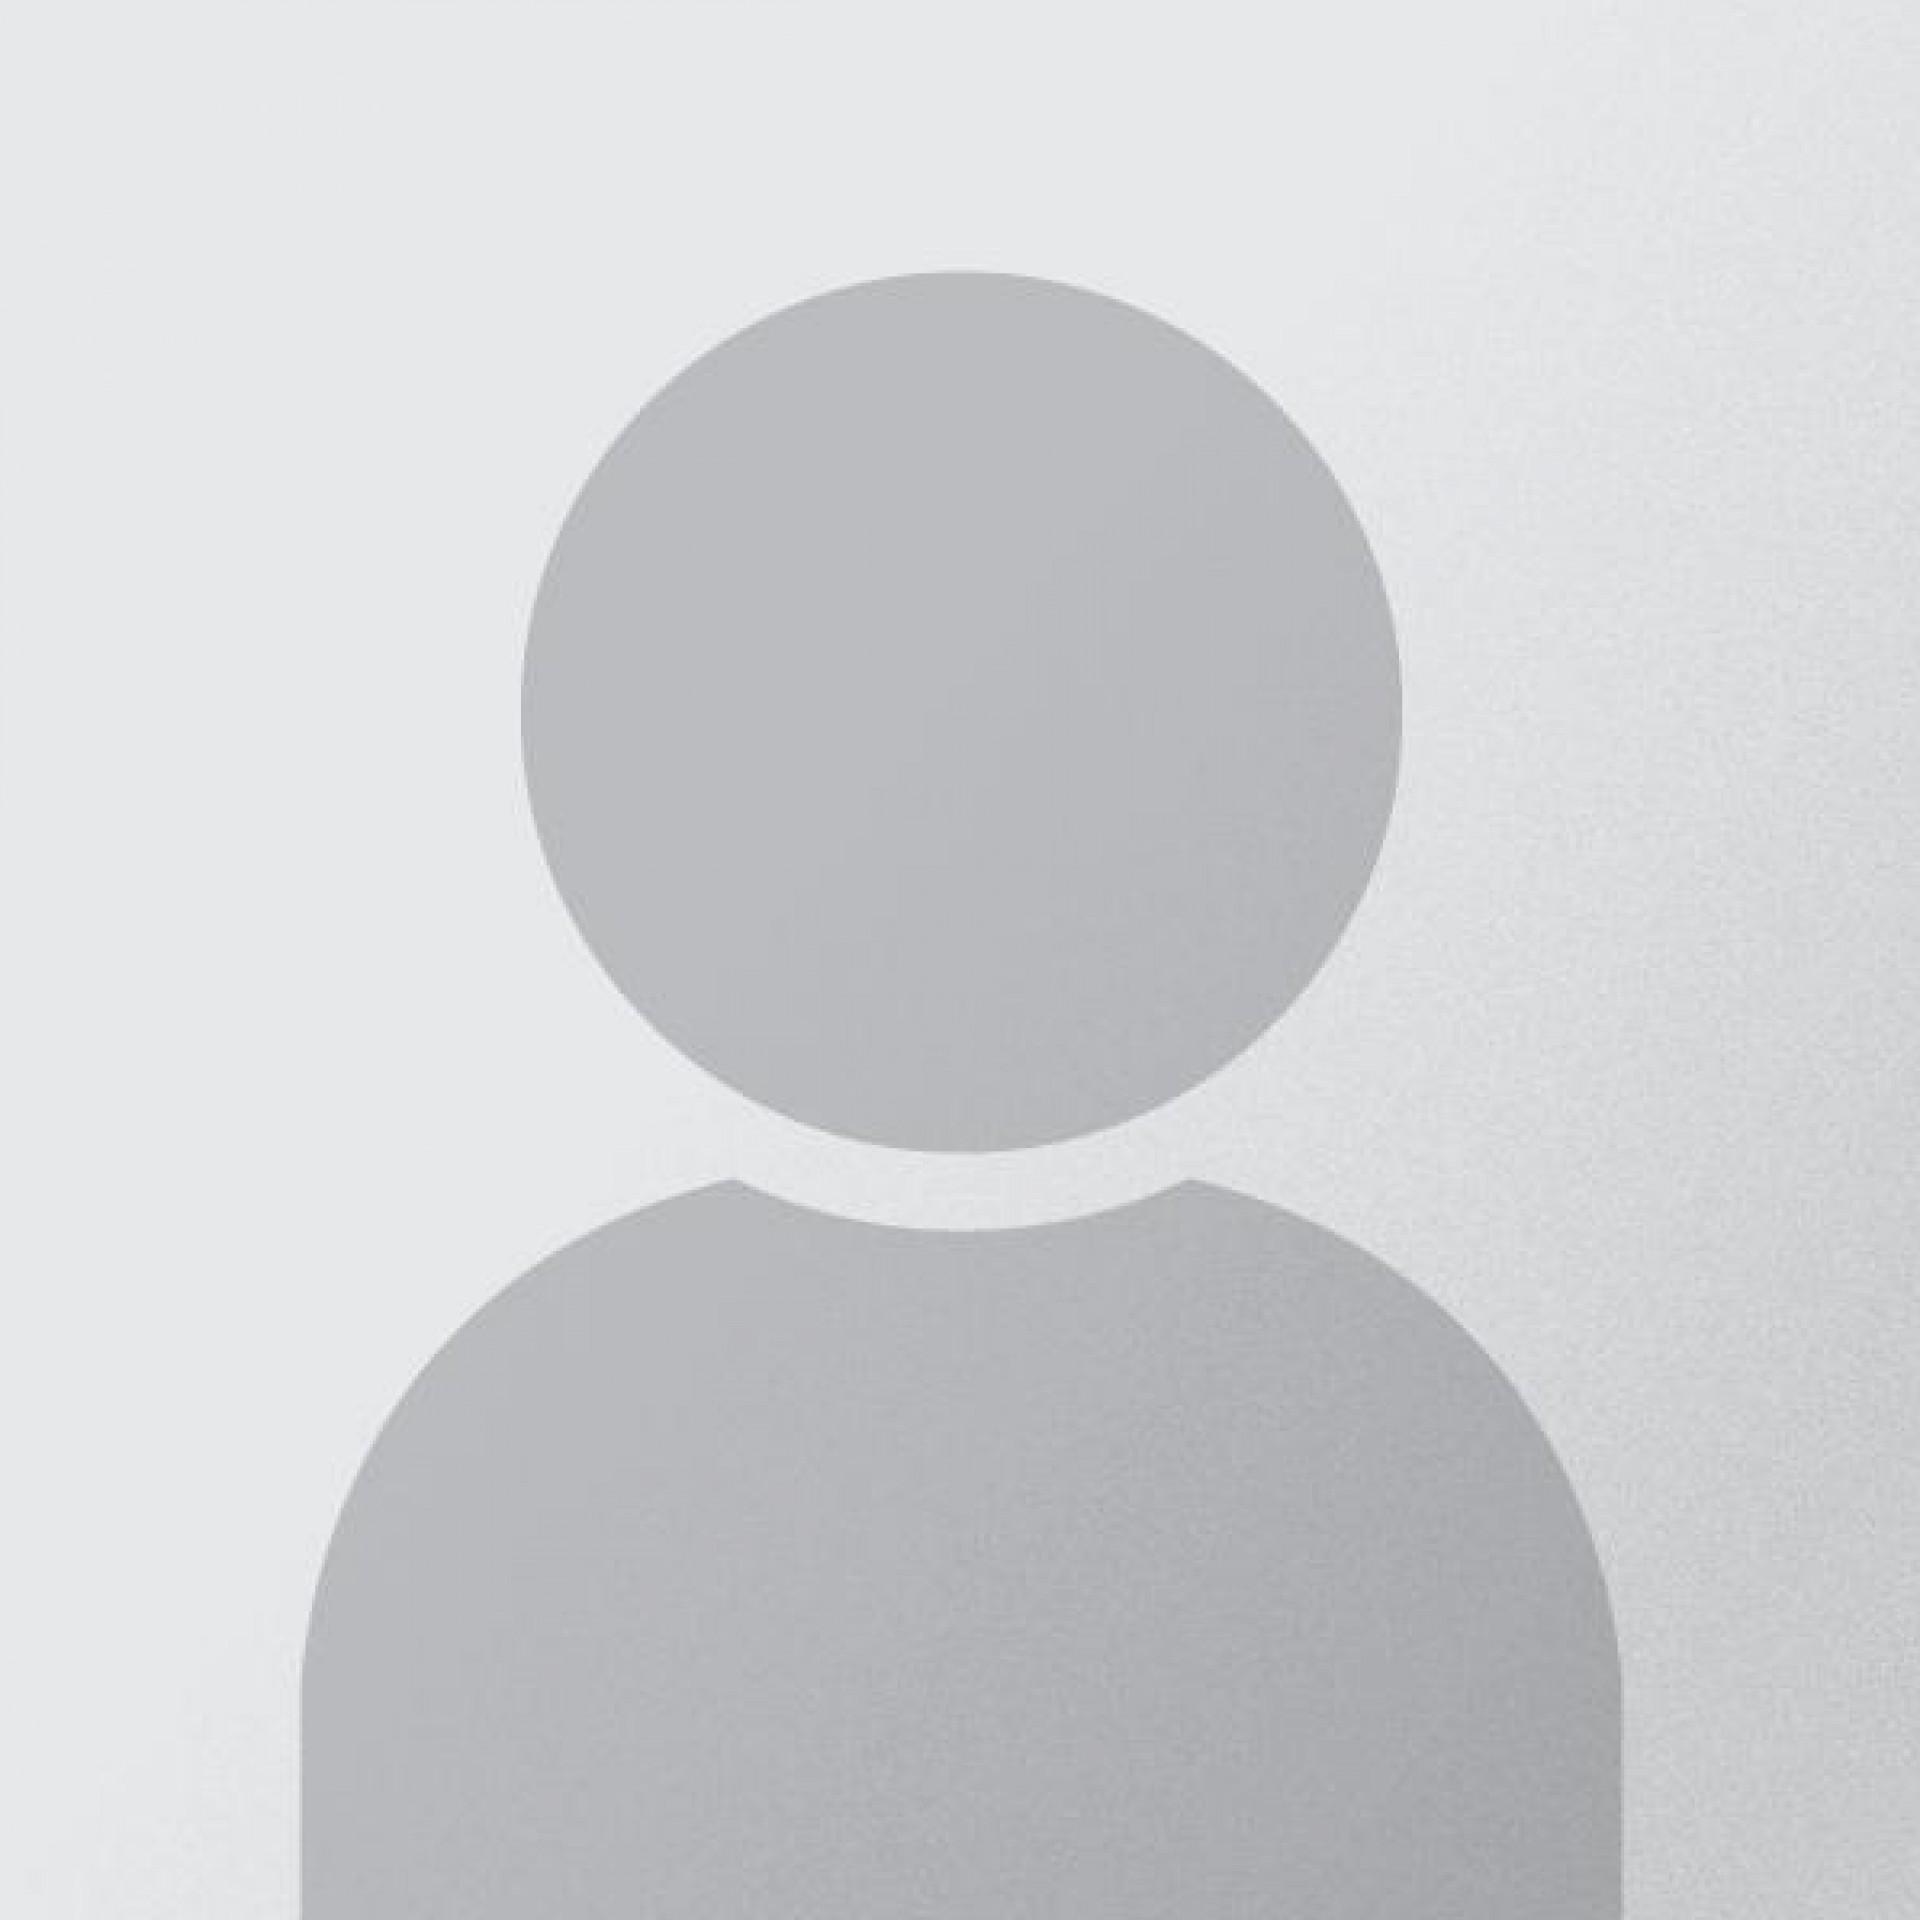 fotografia p021 profilu 0101UHYEQP